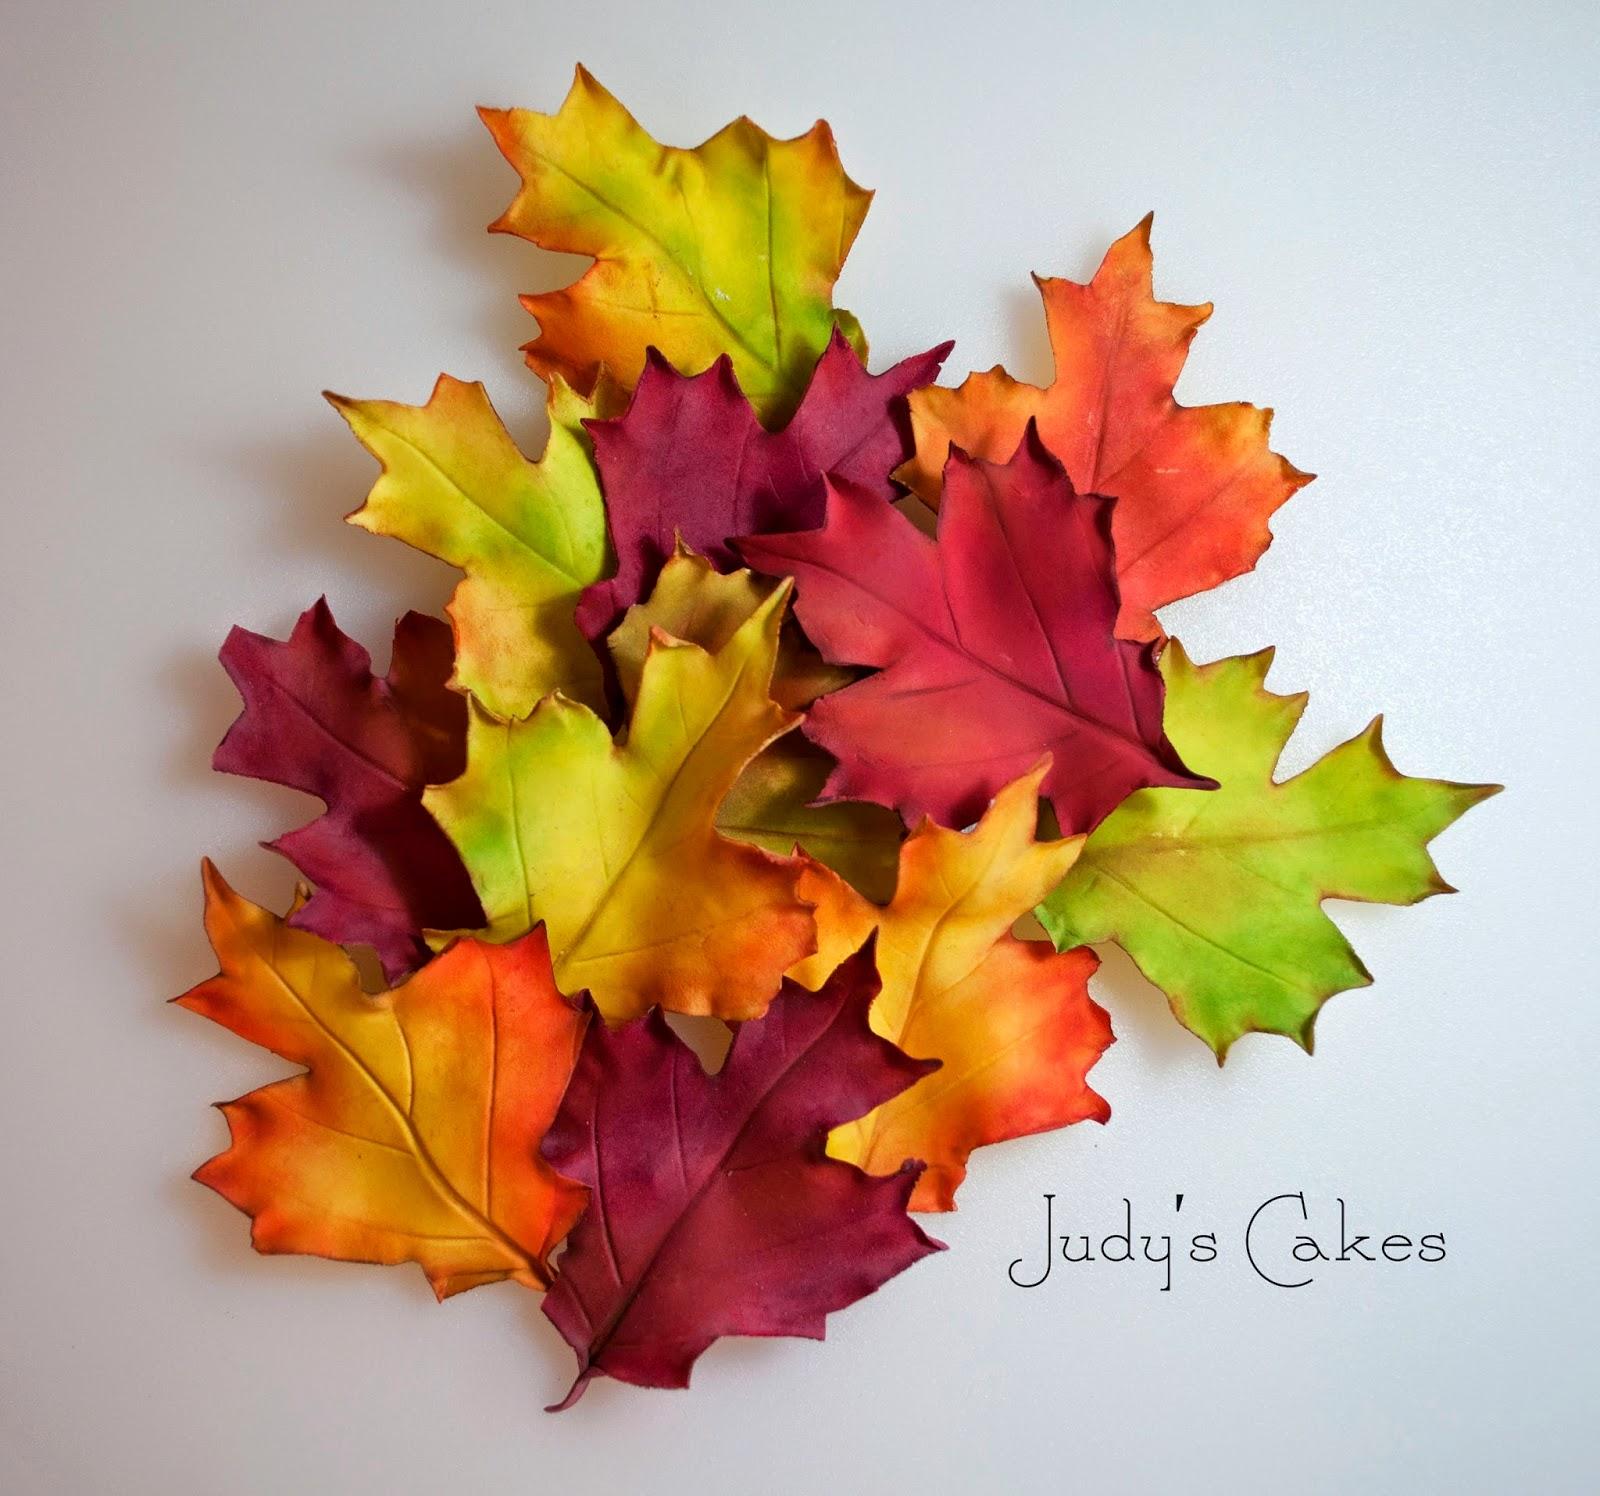 Frank Sinatra - Autumn Leaves Lyrics